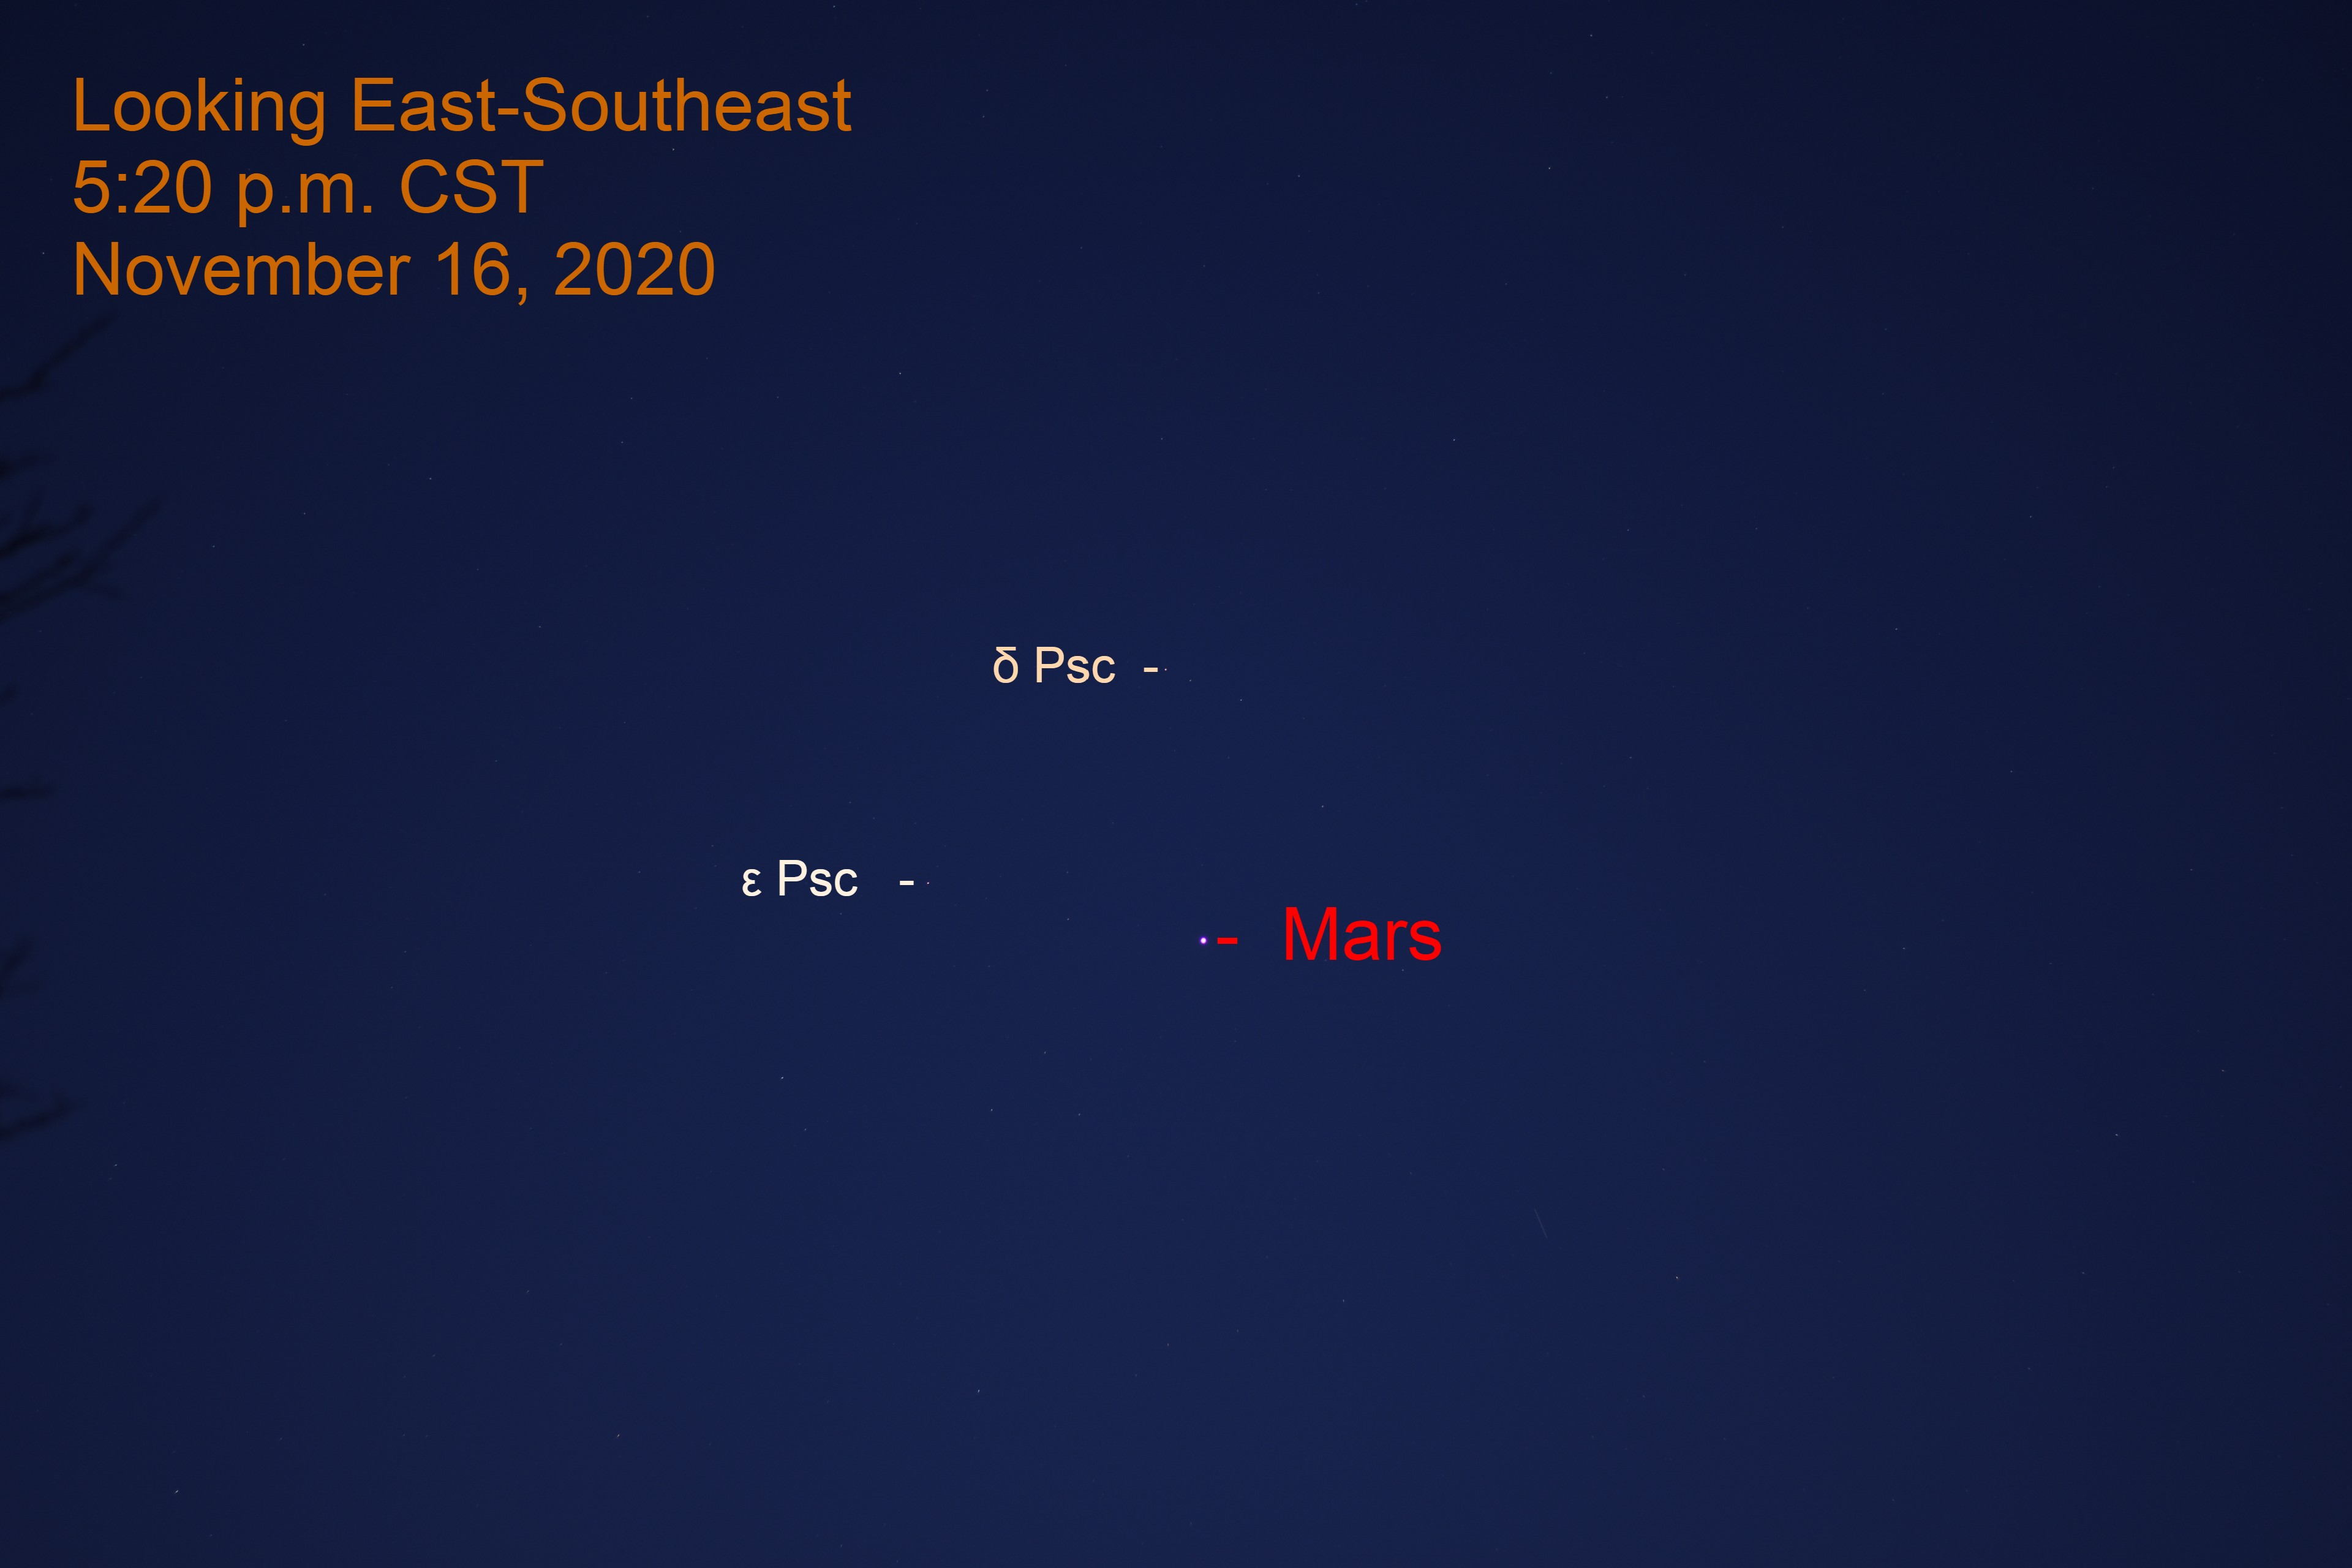 Mars, November 16,2020